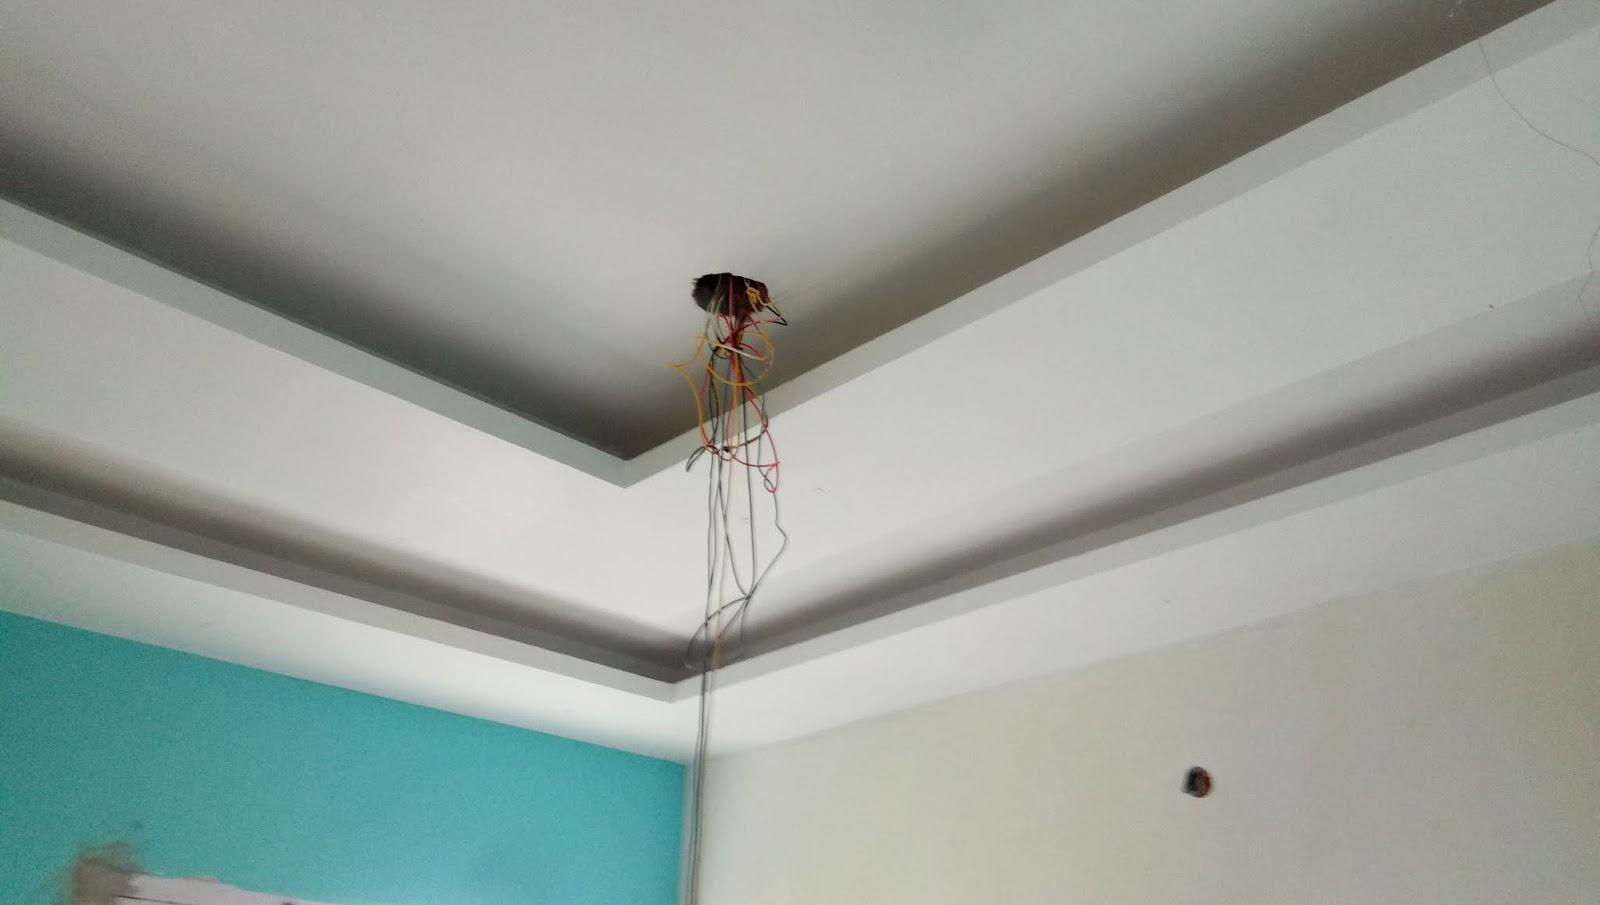 Pop Design Ceiling Pop Design Ceiling